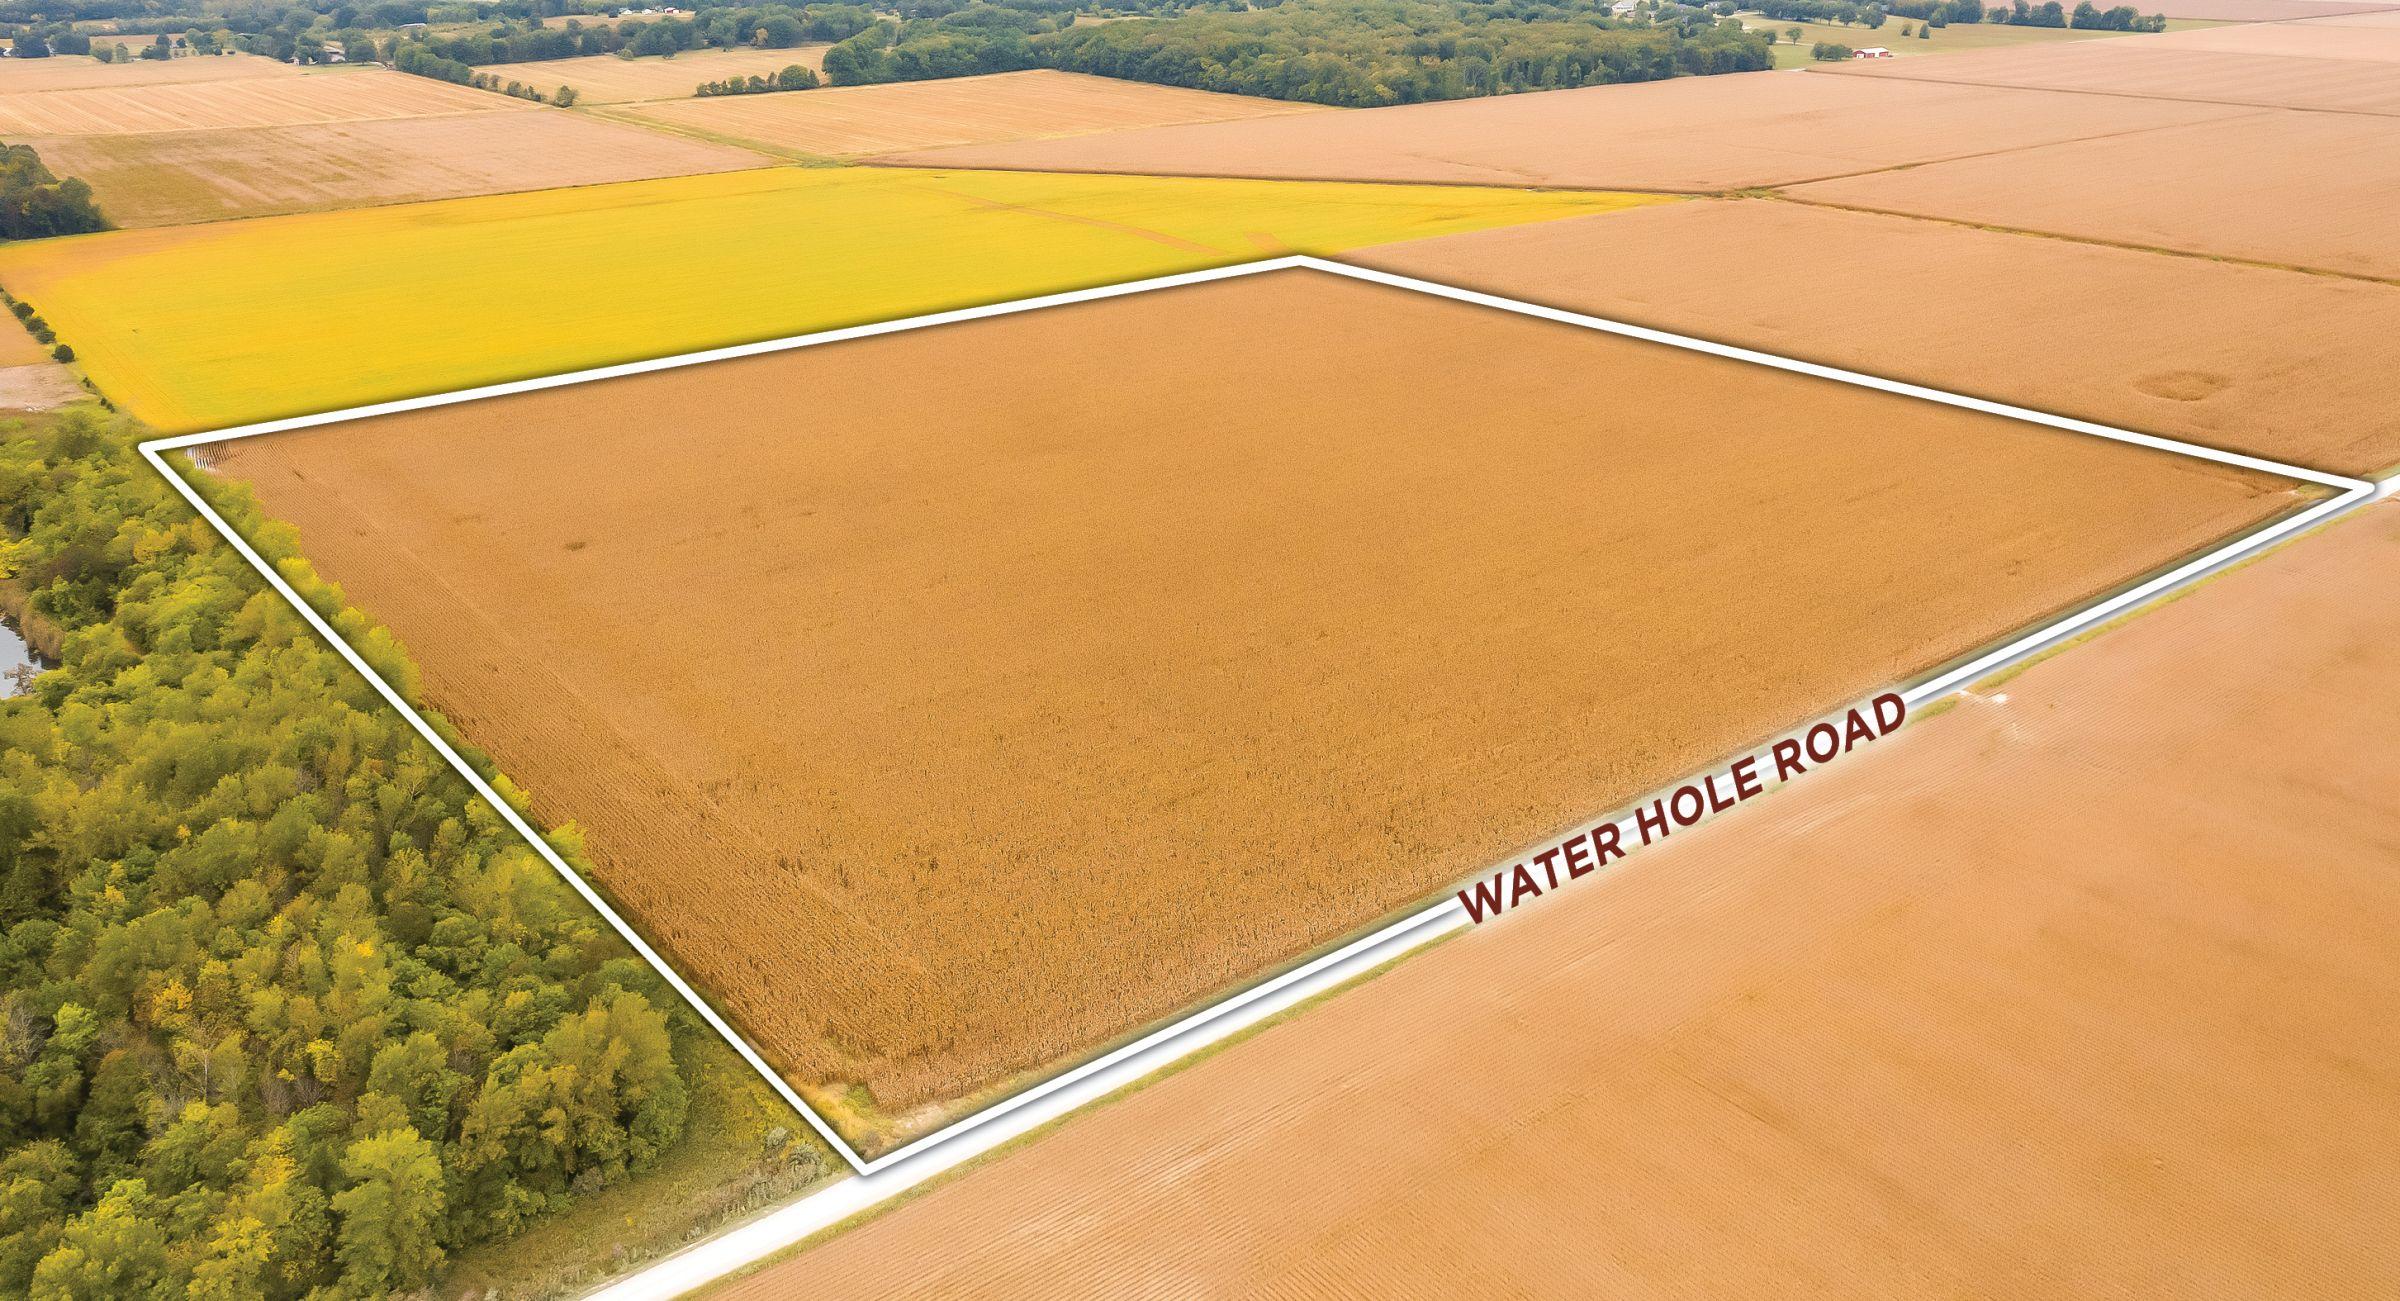 8-water-hole-road-harrisburg-62946-1-2020-10-15-152157.jpg